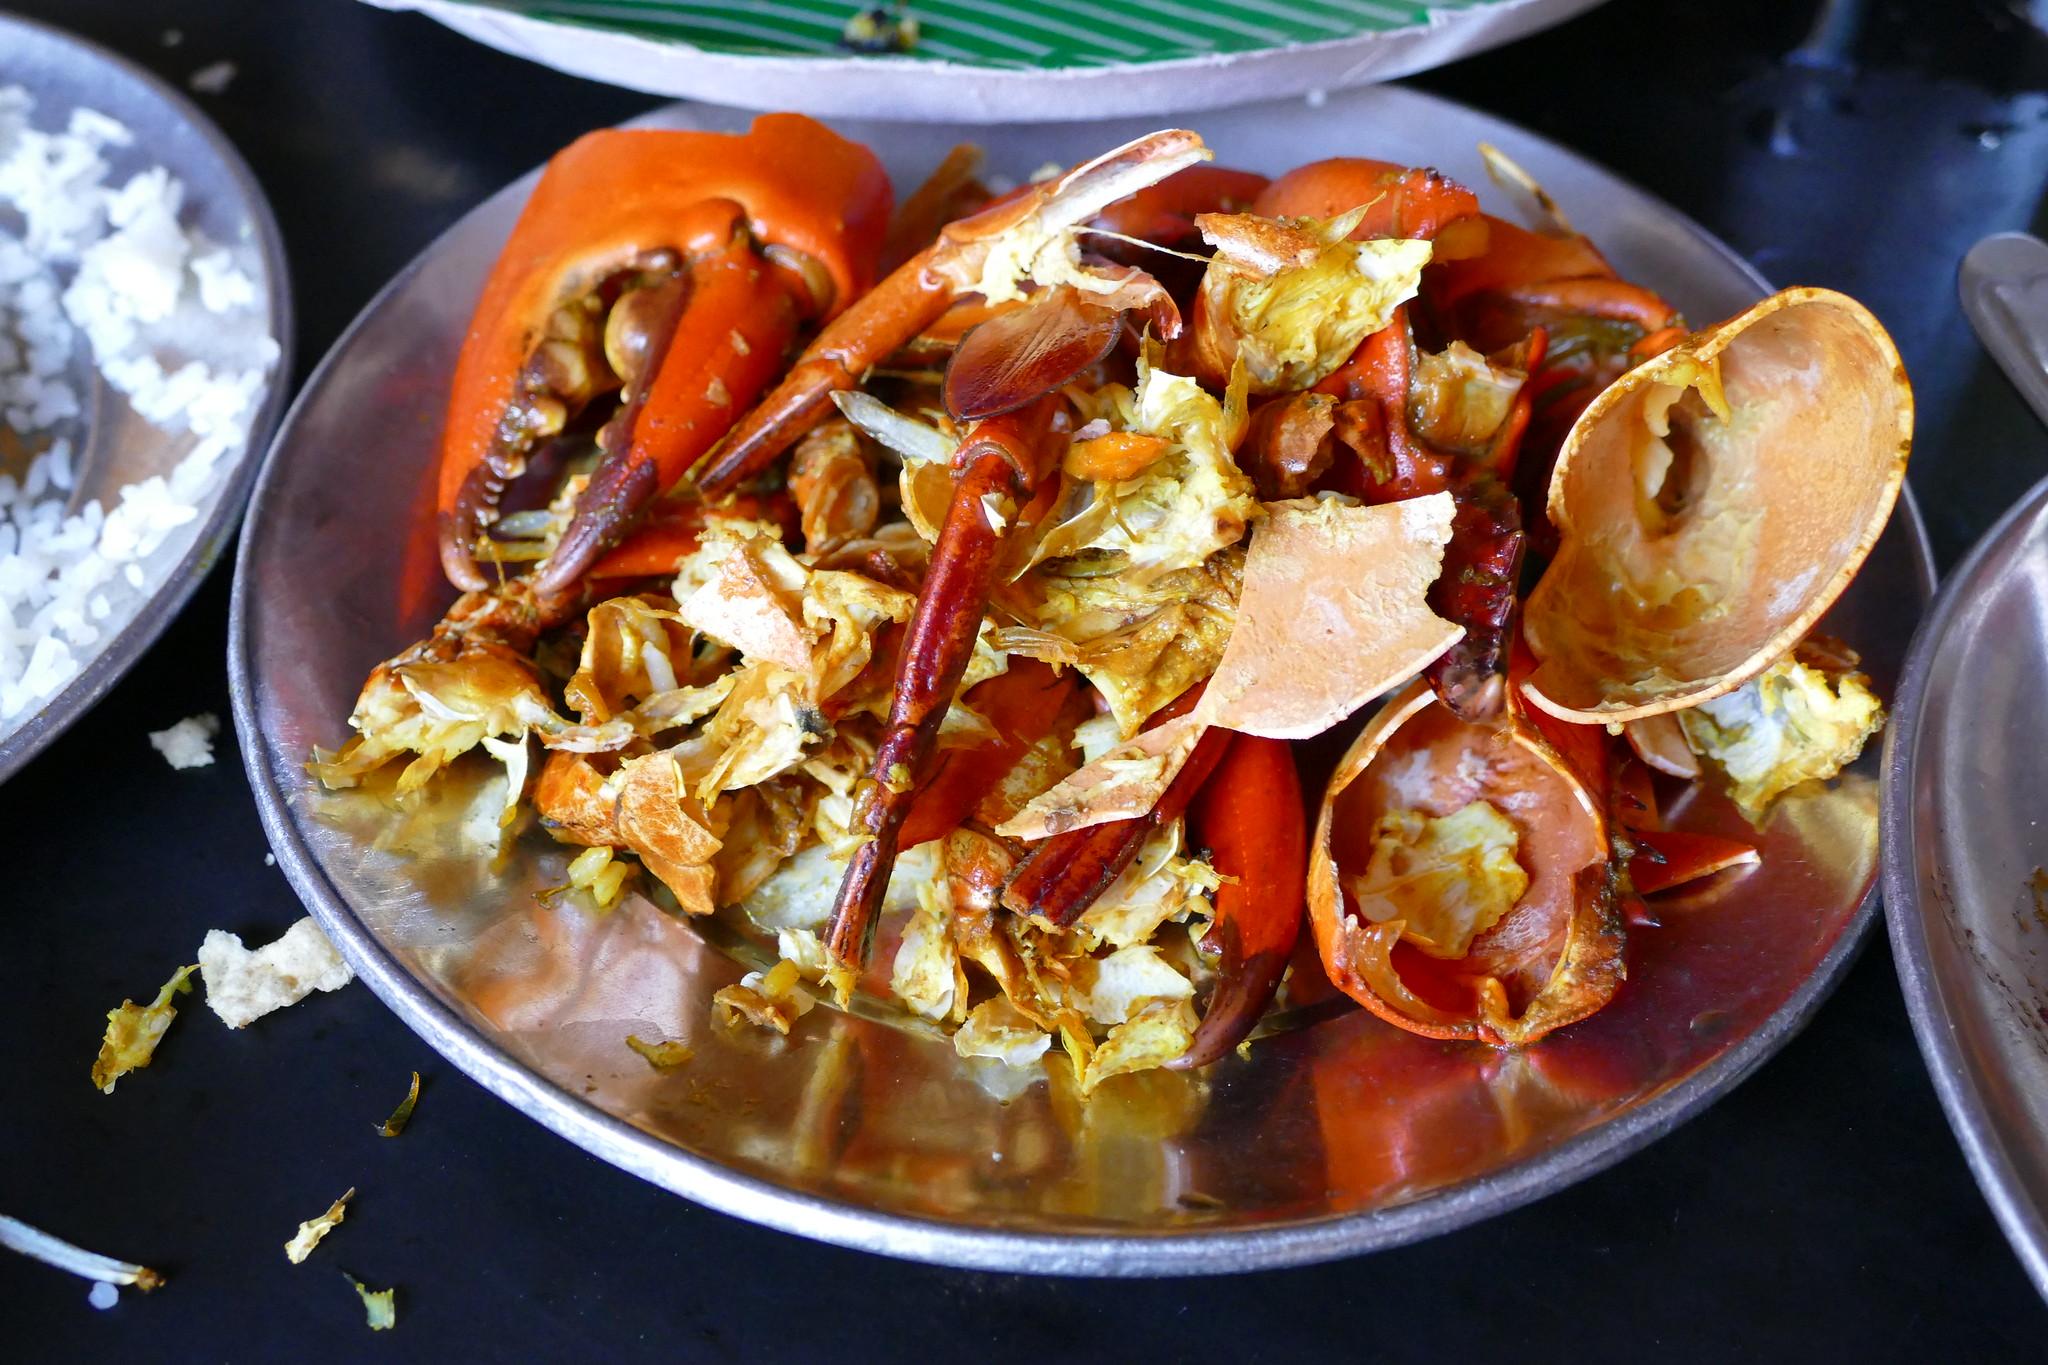 Local odia cuisine - Food in Orissa